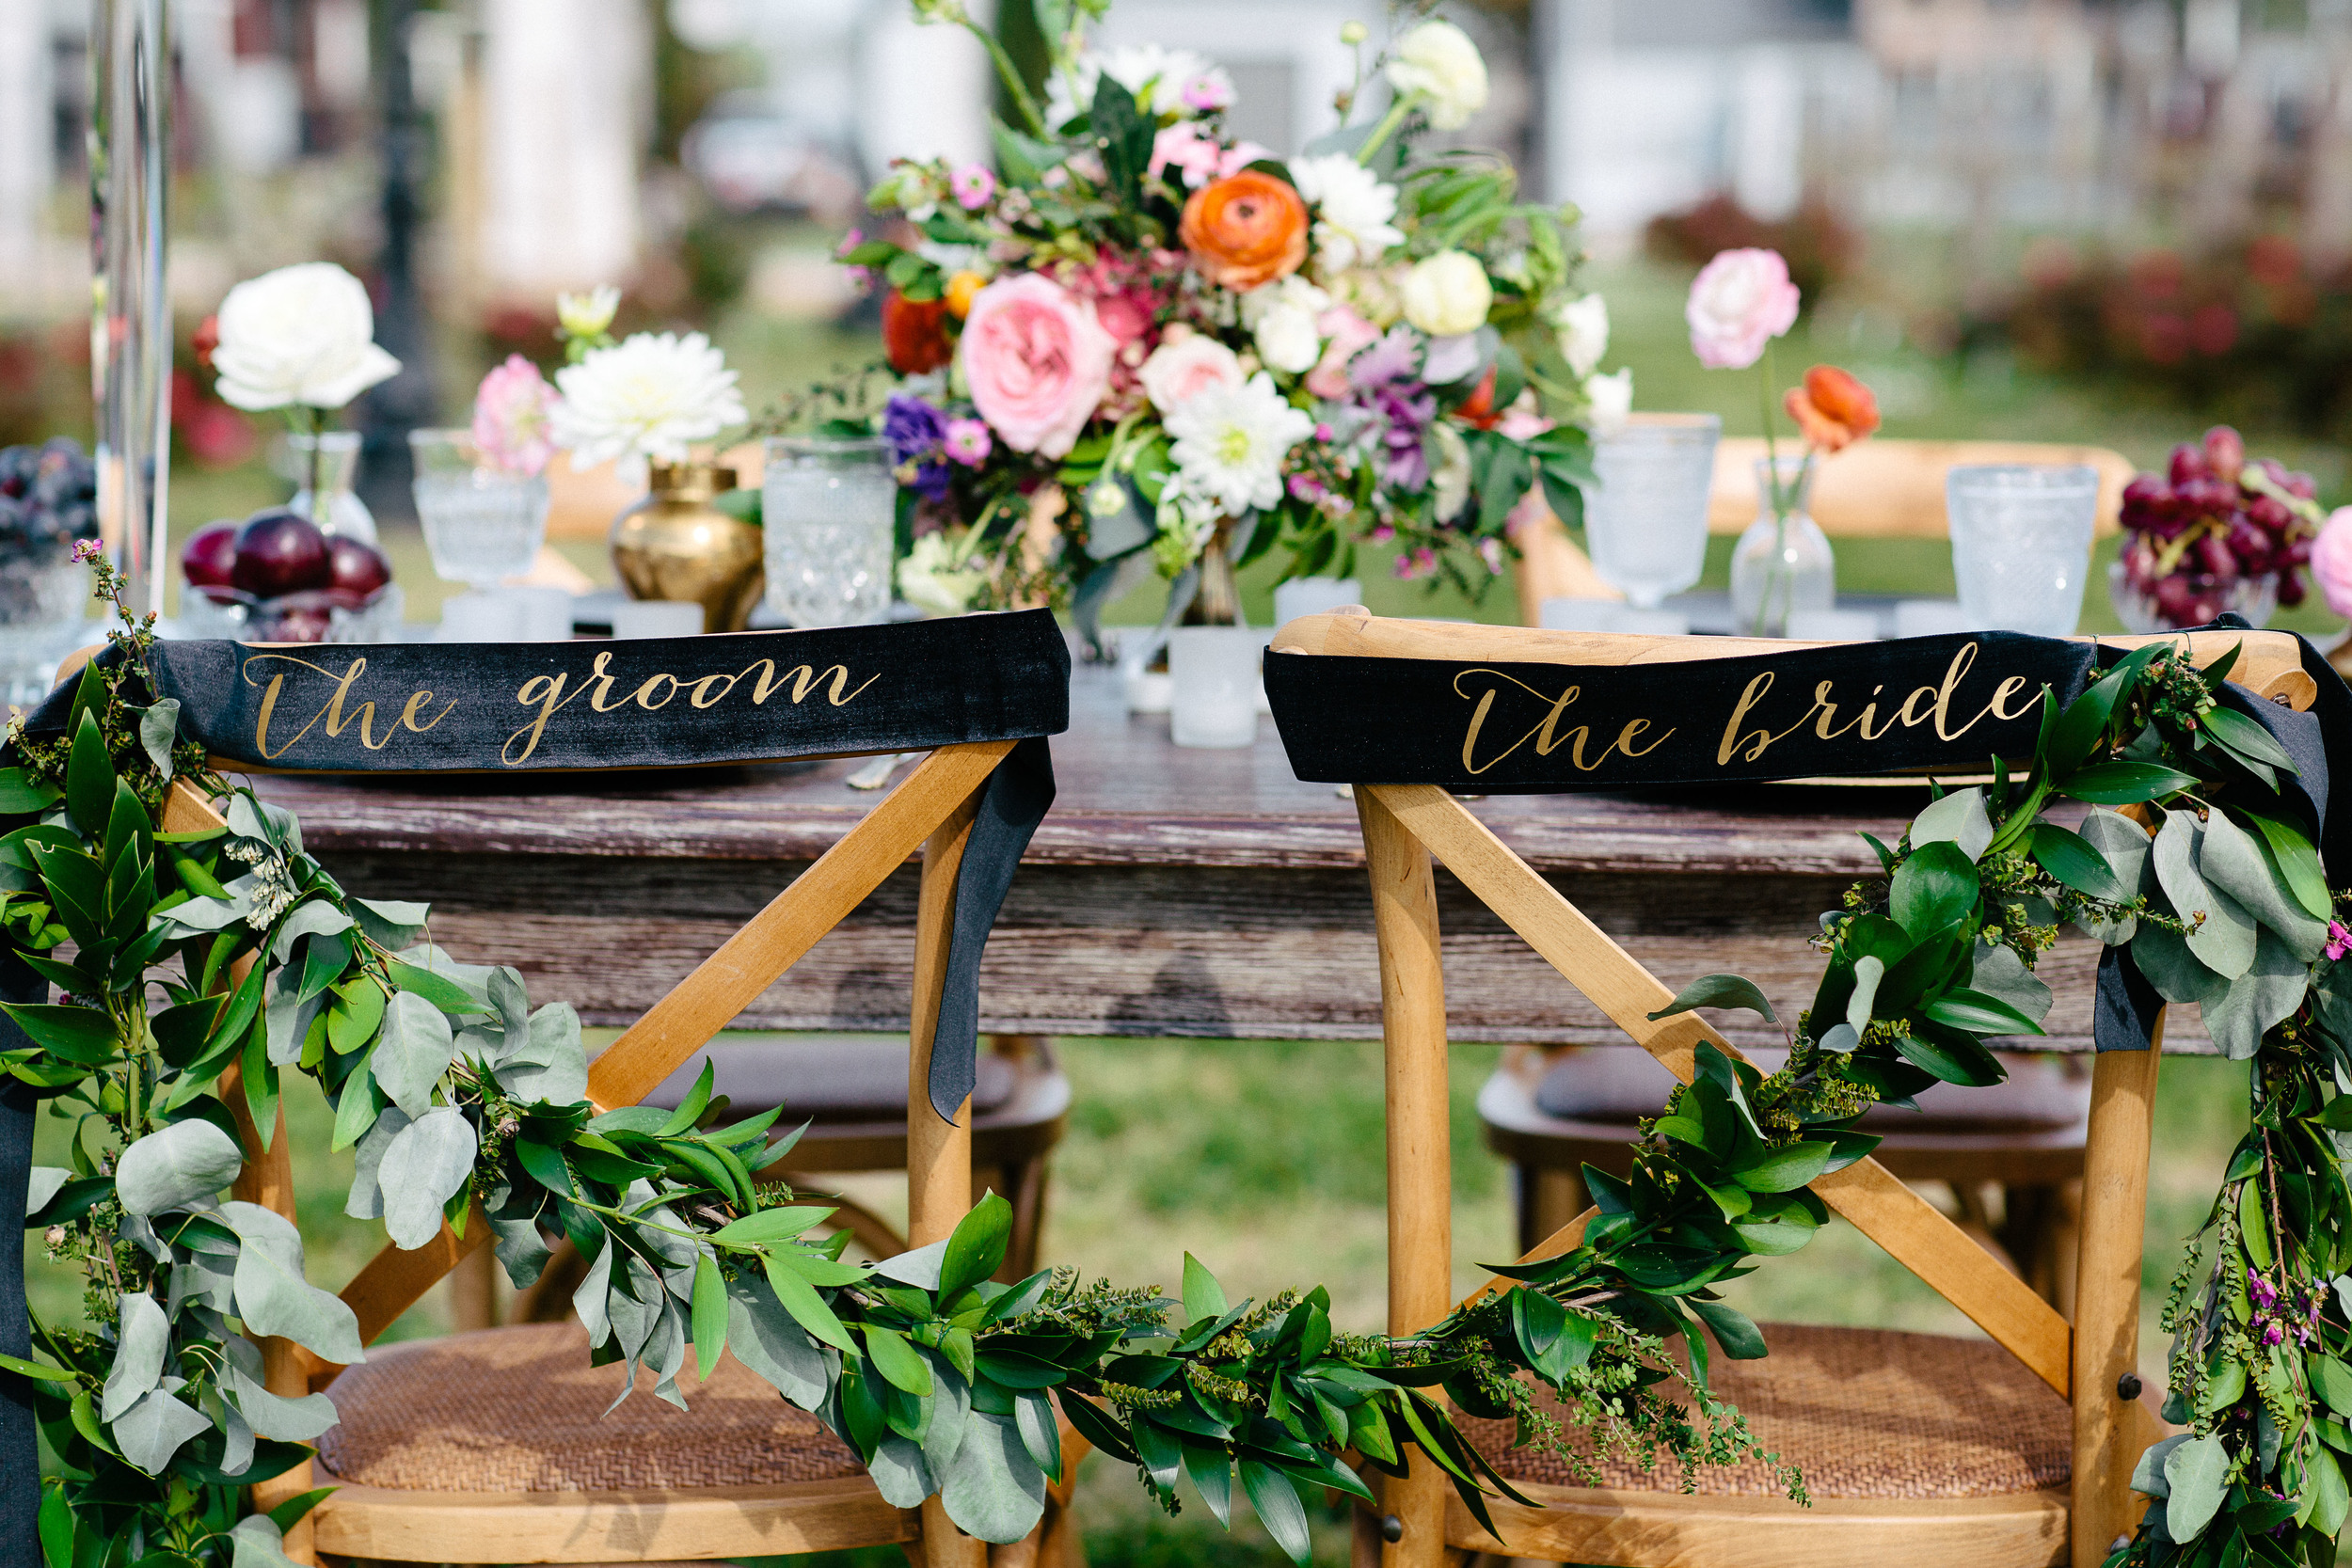 Maxit Flower Design; Vineyard Bridal Styled Shoot 0113_Kristen Curette Photography.jpg